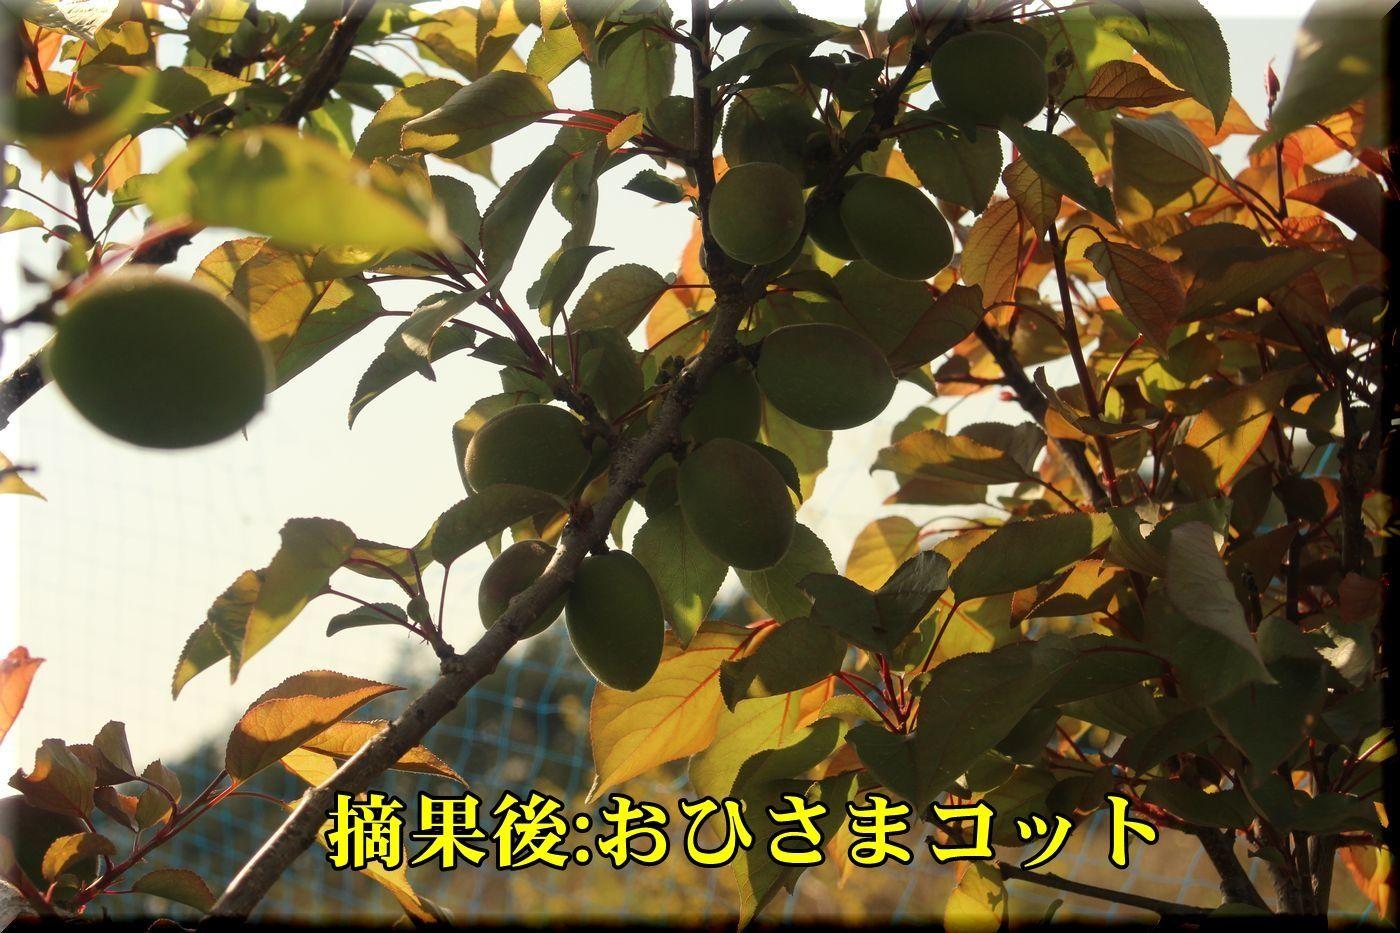 1T_ohisama180420_012.jpg